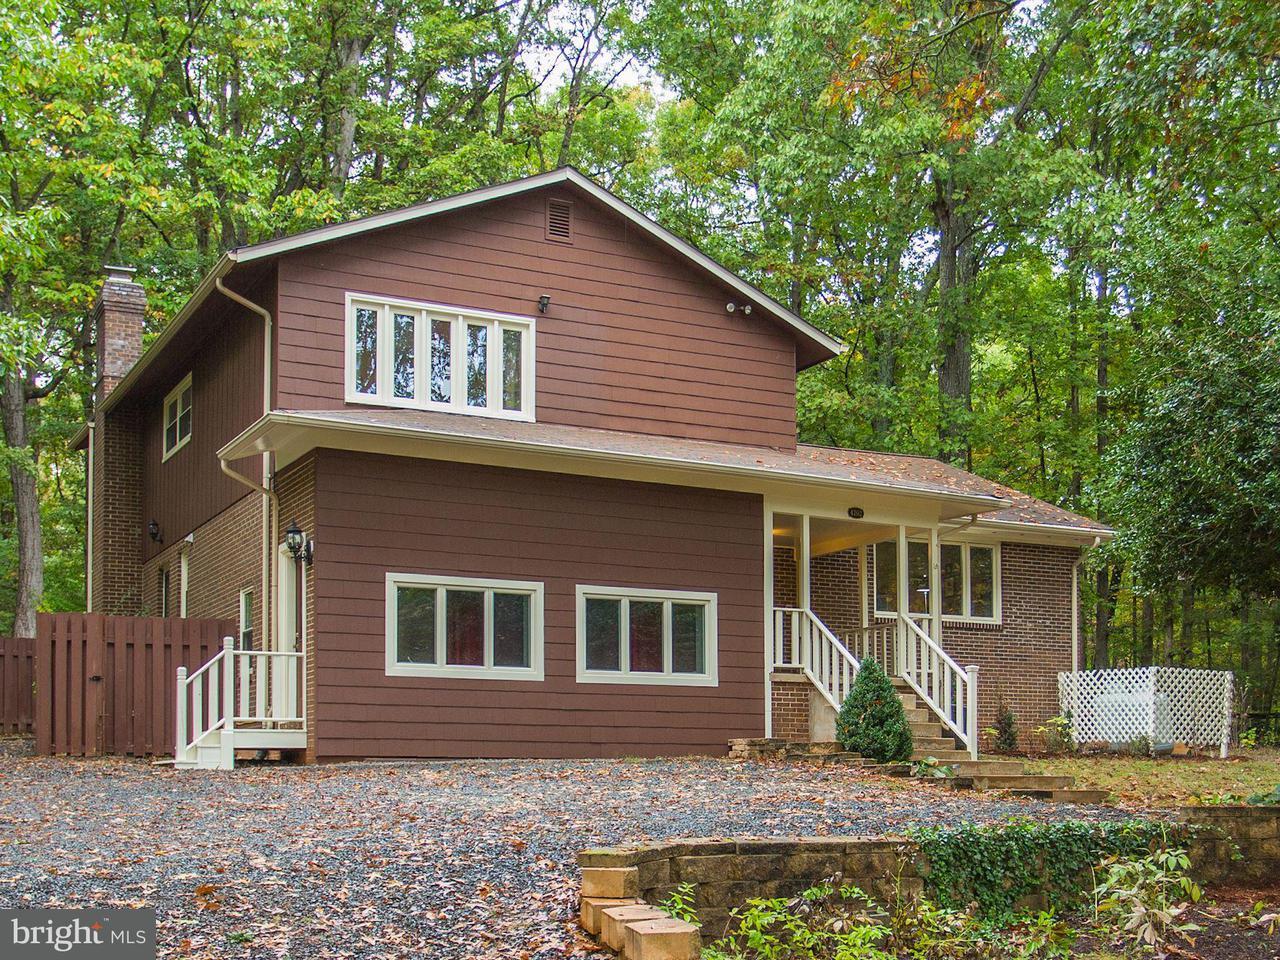 Single Family Home for Sale at 4202 SAINT STEPHENS Court 4202 SAINT STEPHENS Court Catlett, Virginia 20119 United States